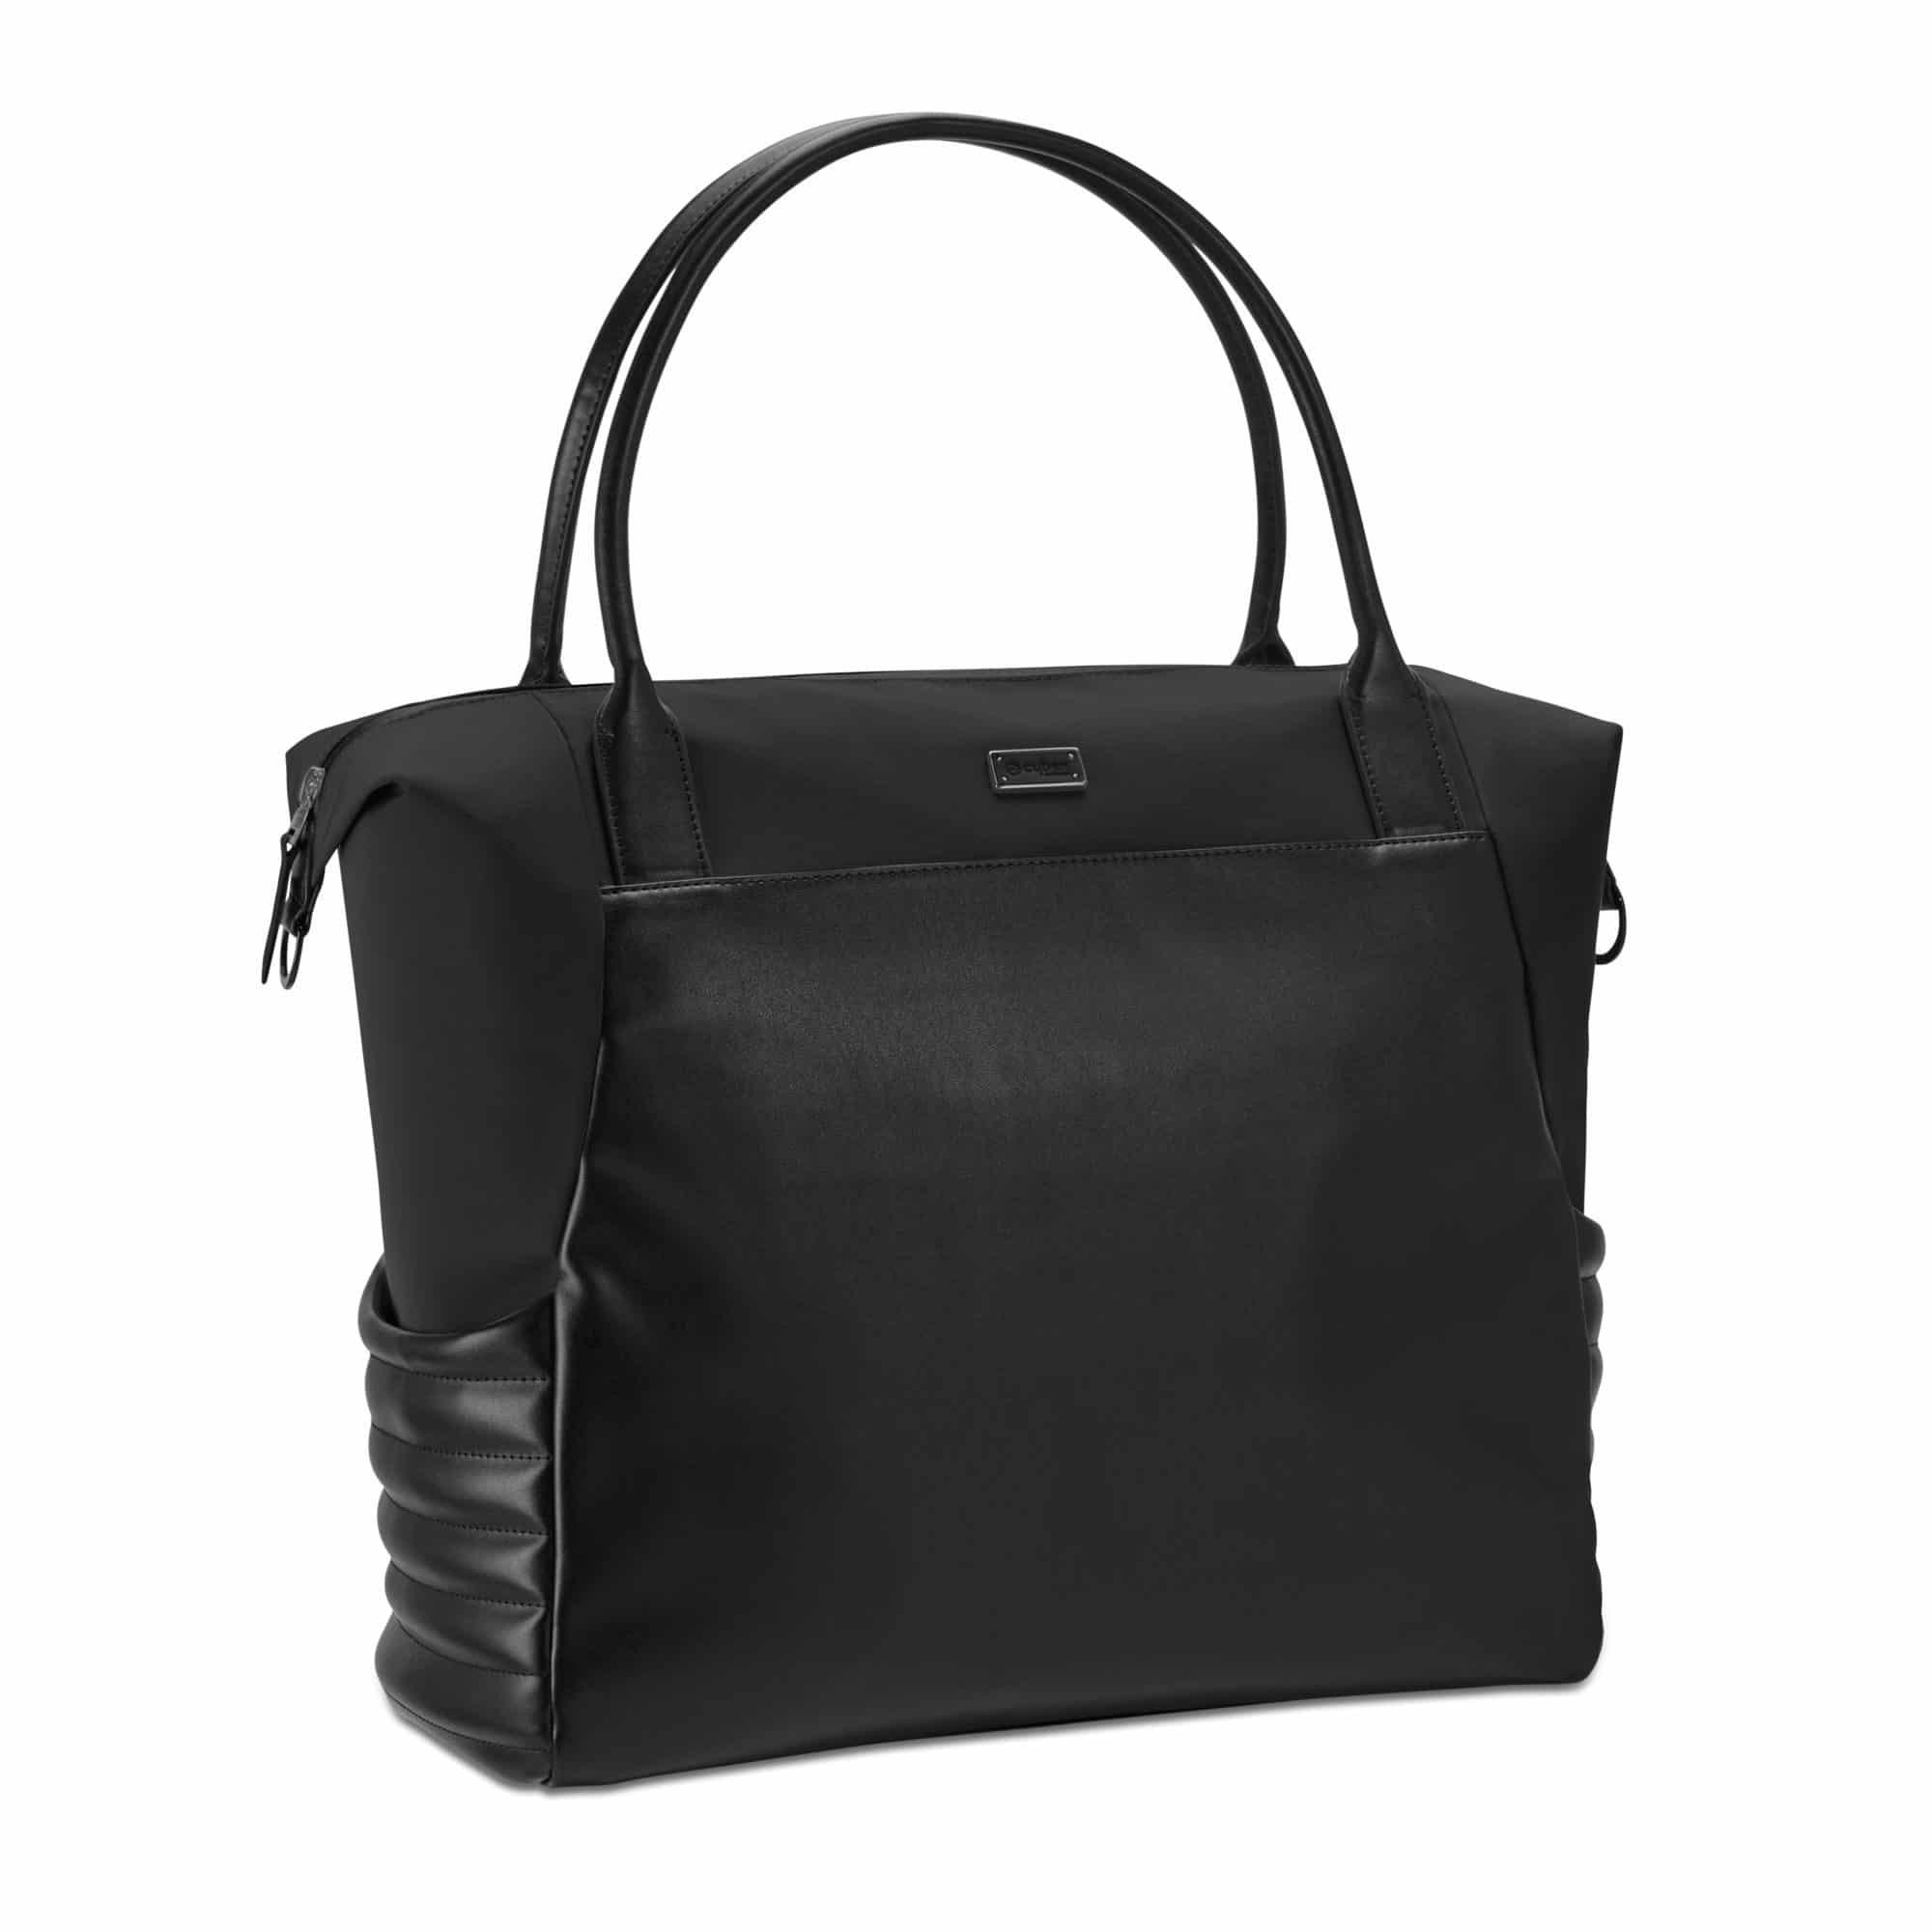 Cybex Priam Τσάντα αλλαγής Deep Black